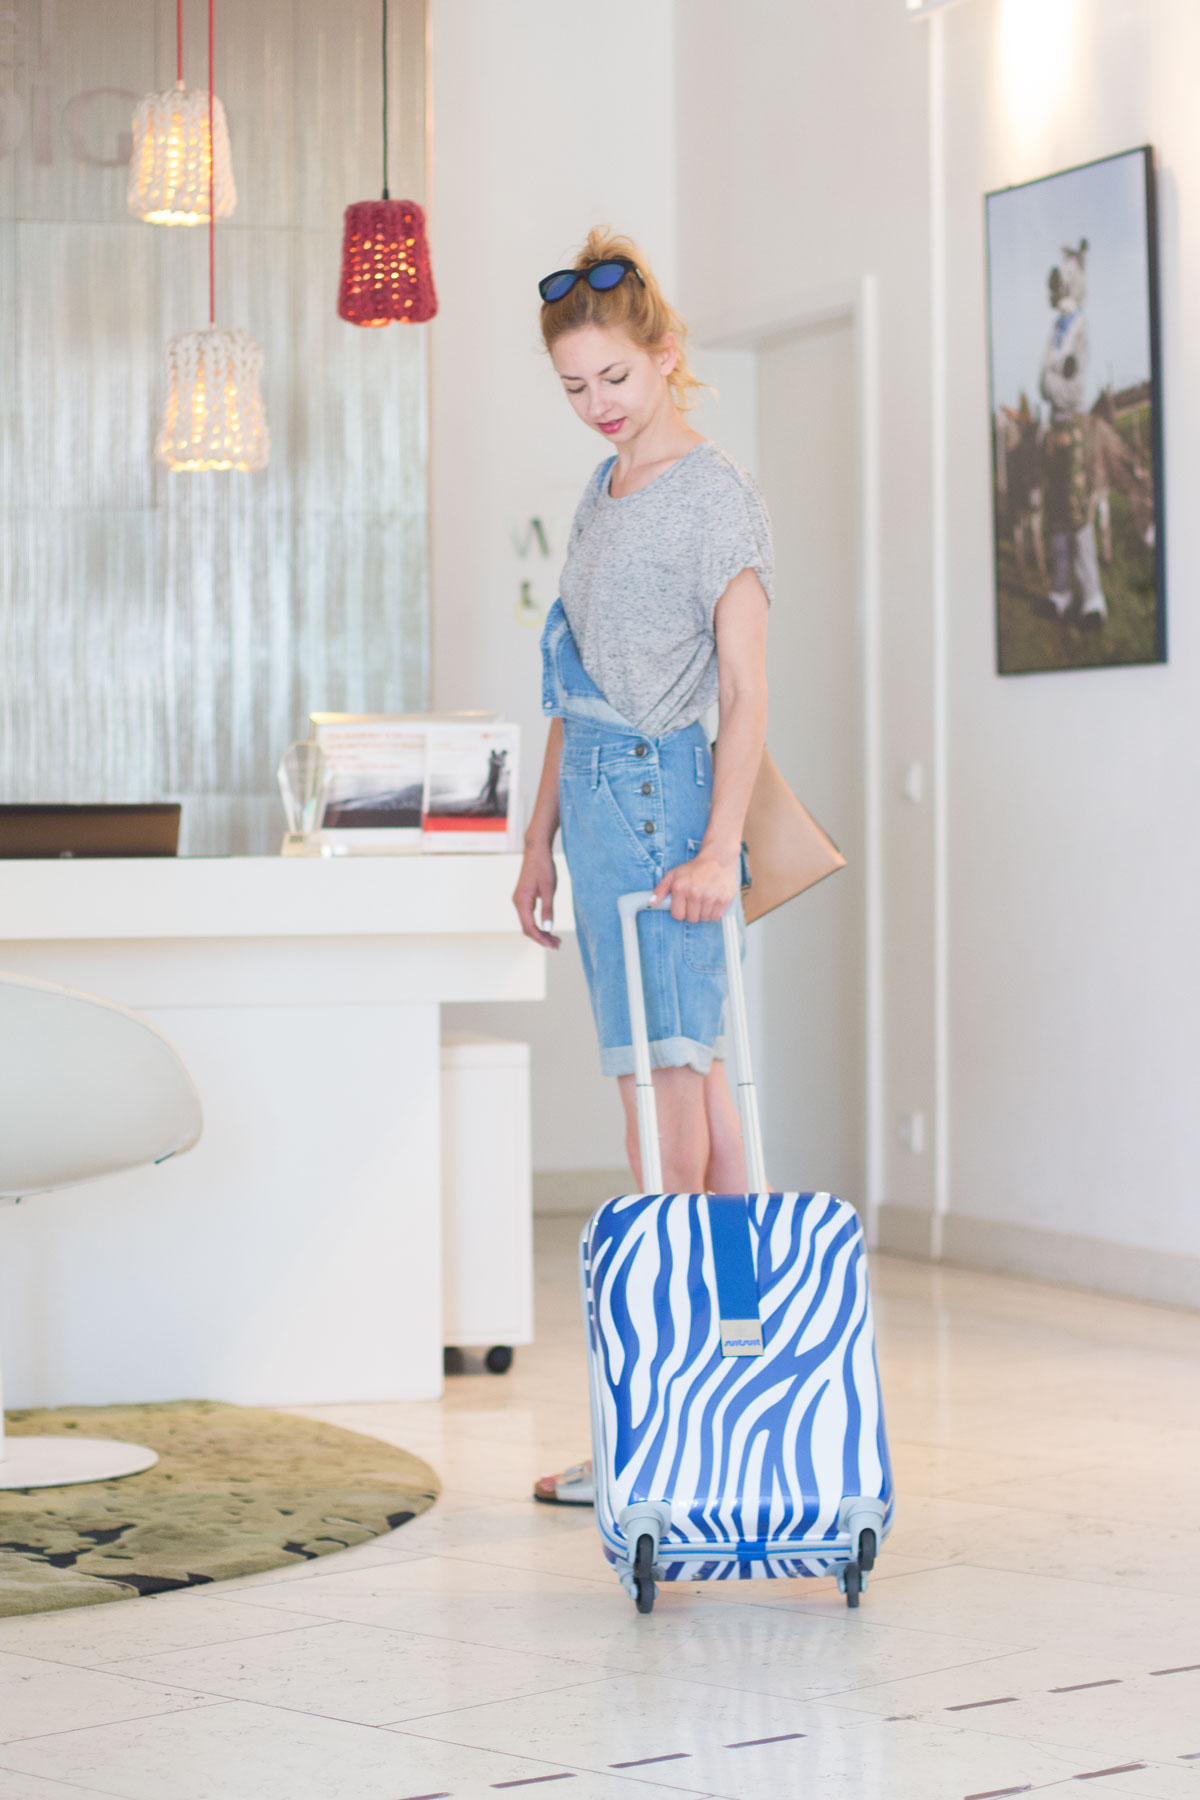 MBFW Berlin - Hotel Indigo Berlin Ku'damm II photos: Benedikt Napolowski II How I met my outfit